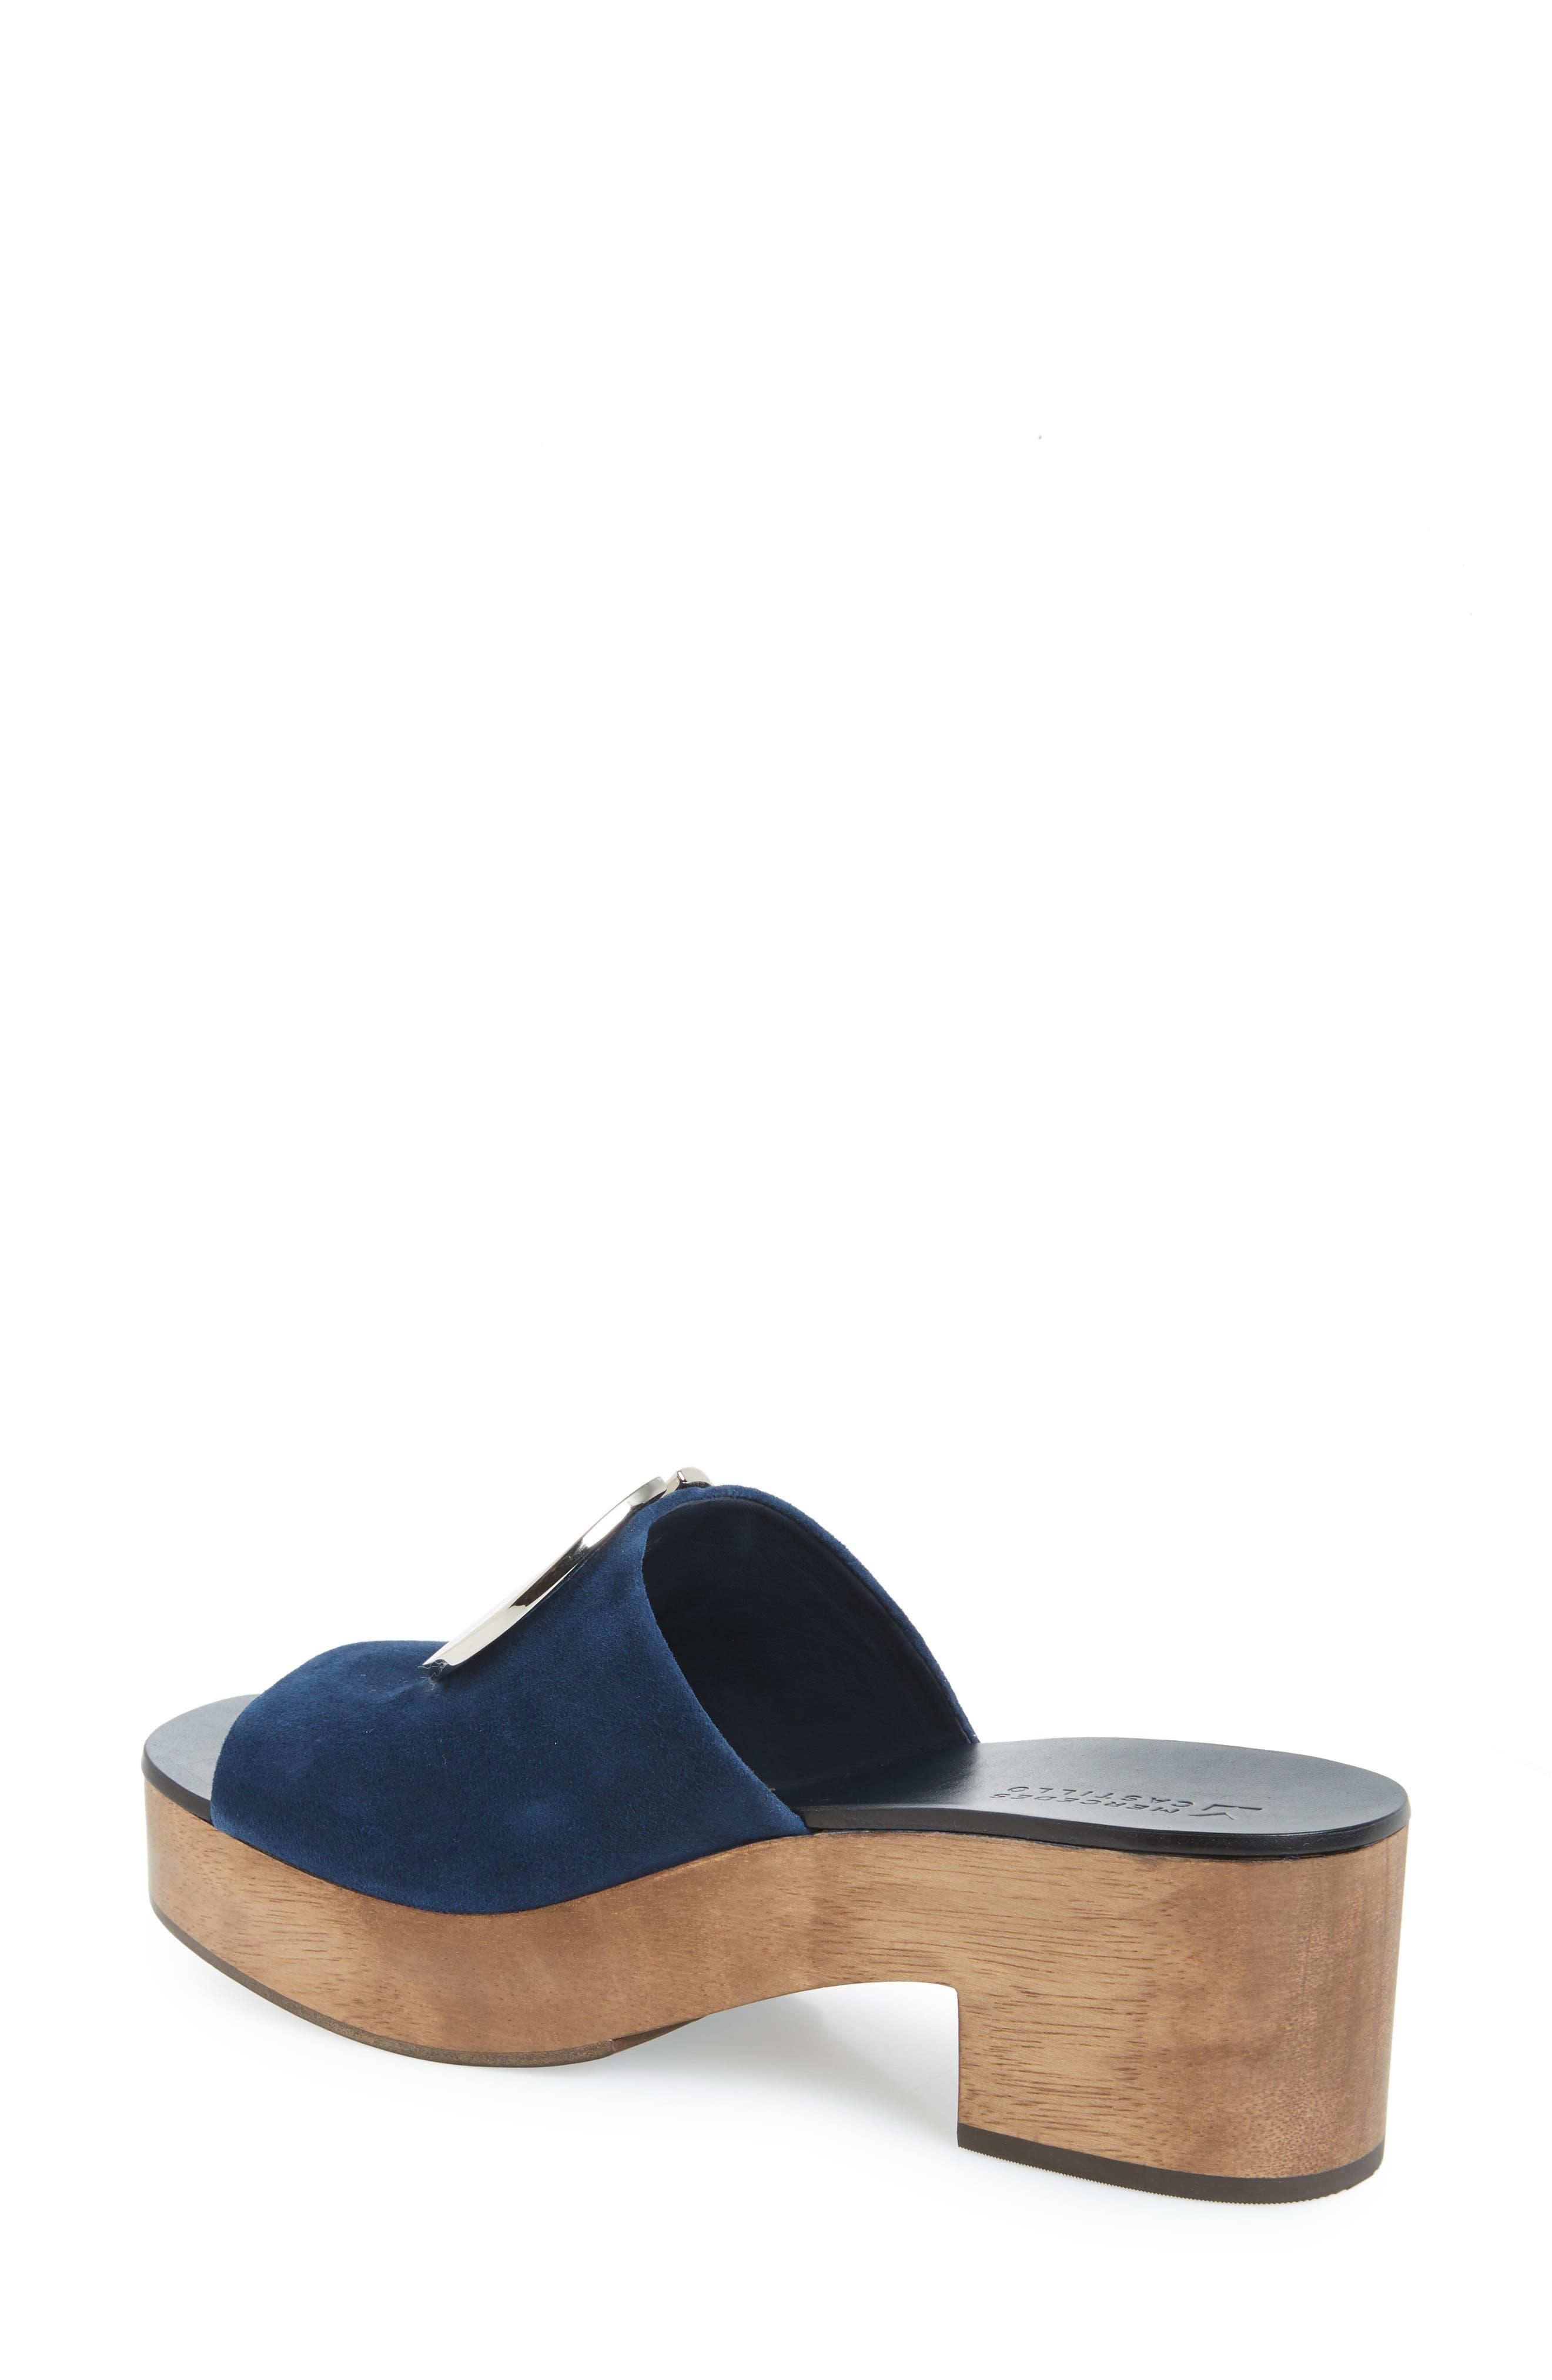 Kamilia Platform Sandal,                             Alternate thumbnail 4, color,